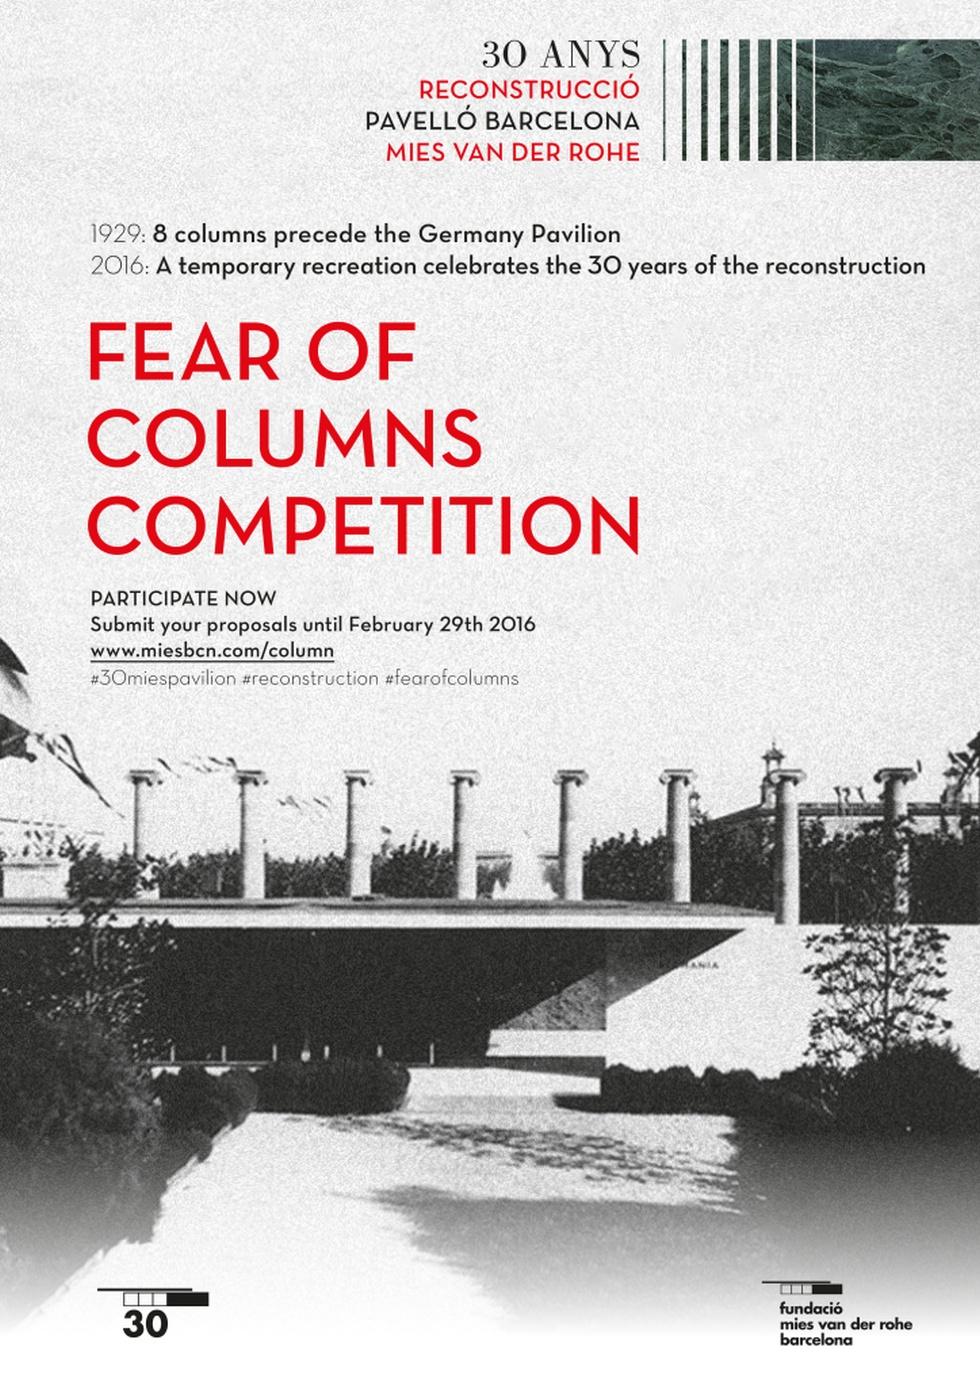 Fear of columns